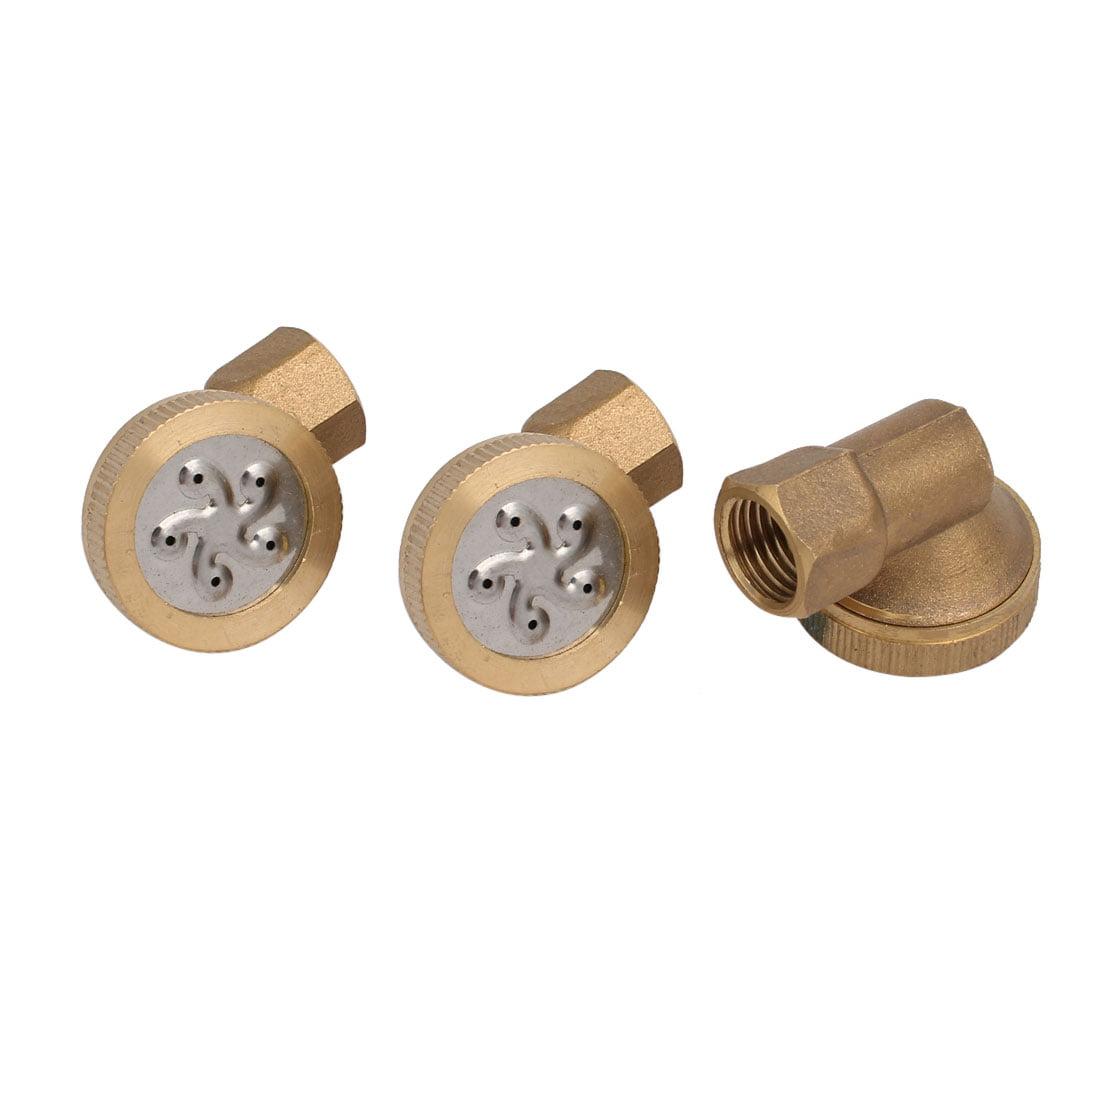 1 4BSP Female Thread 90 Degree 5-Hole Garden Sprinkler Misting Spray Nozzle 3pcs by Unique-Bargains